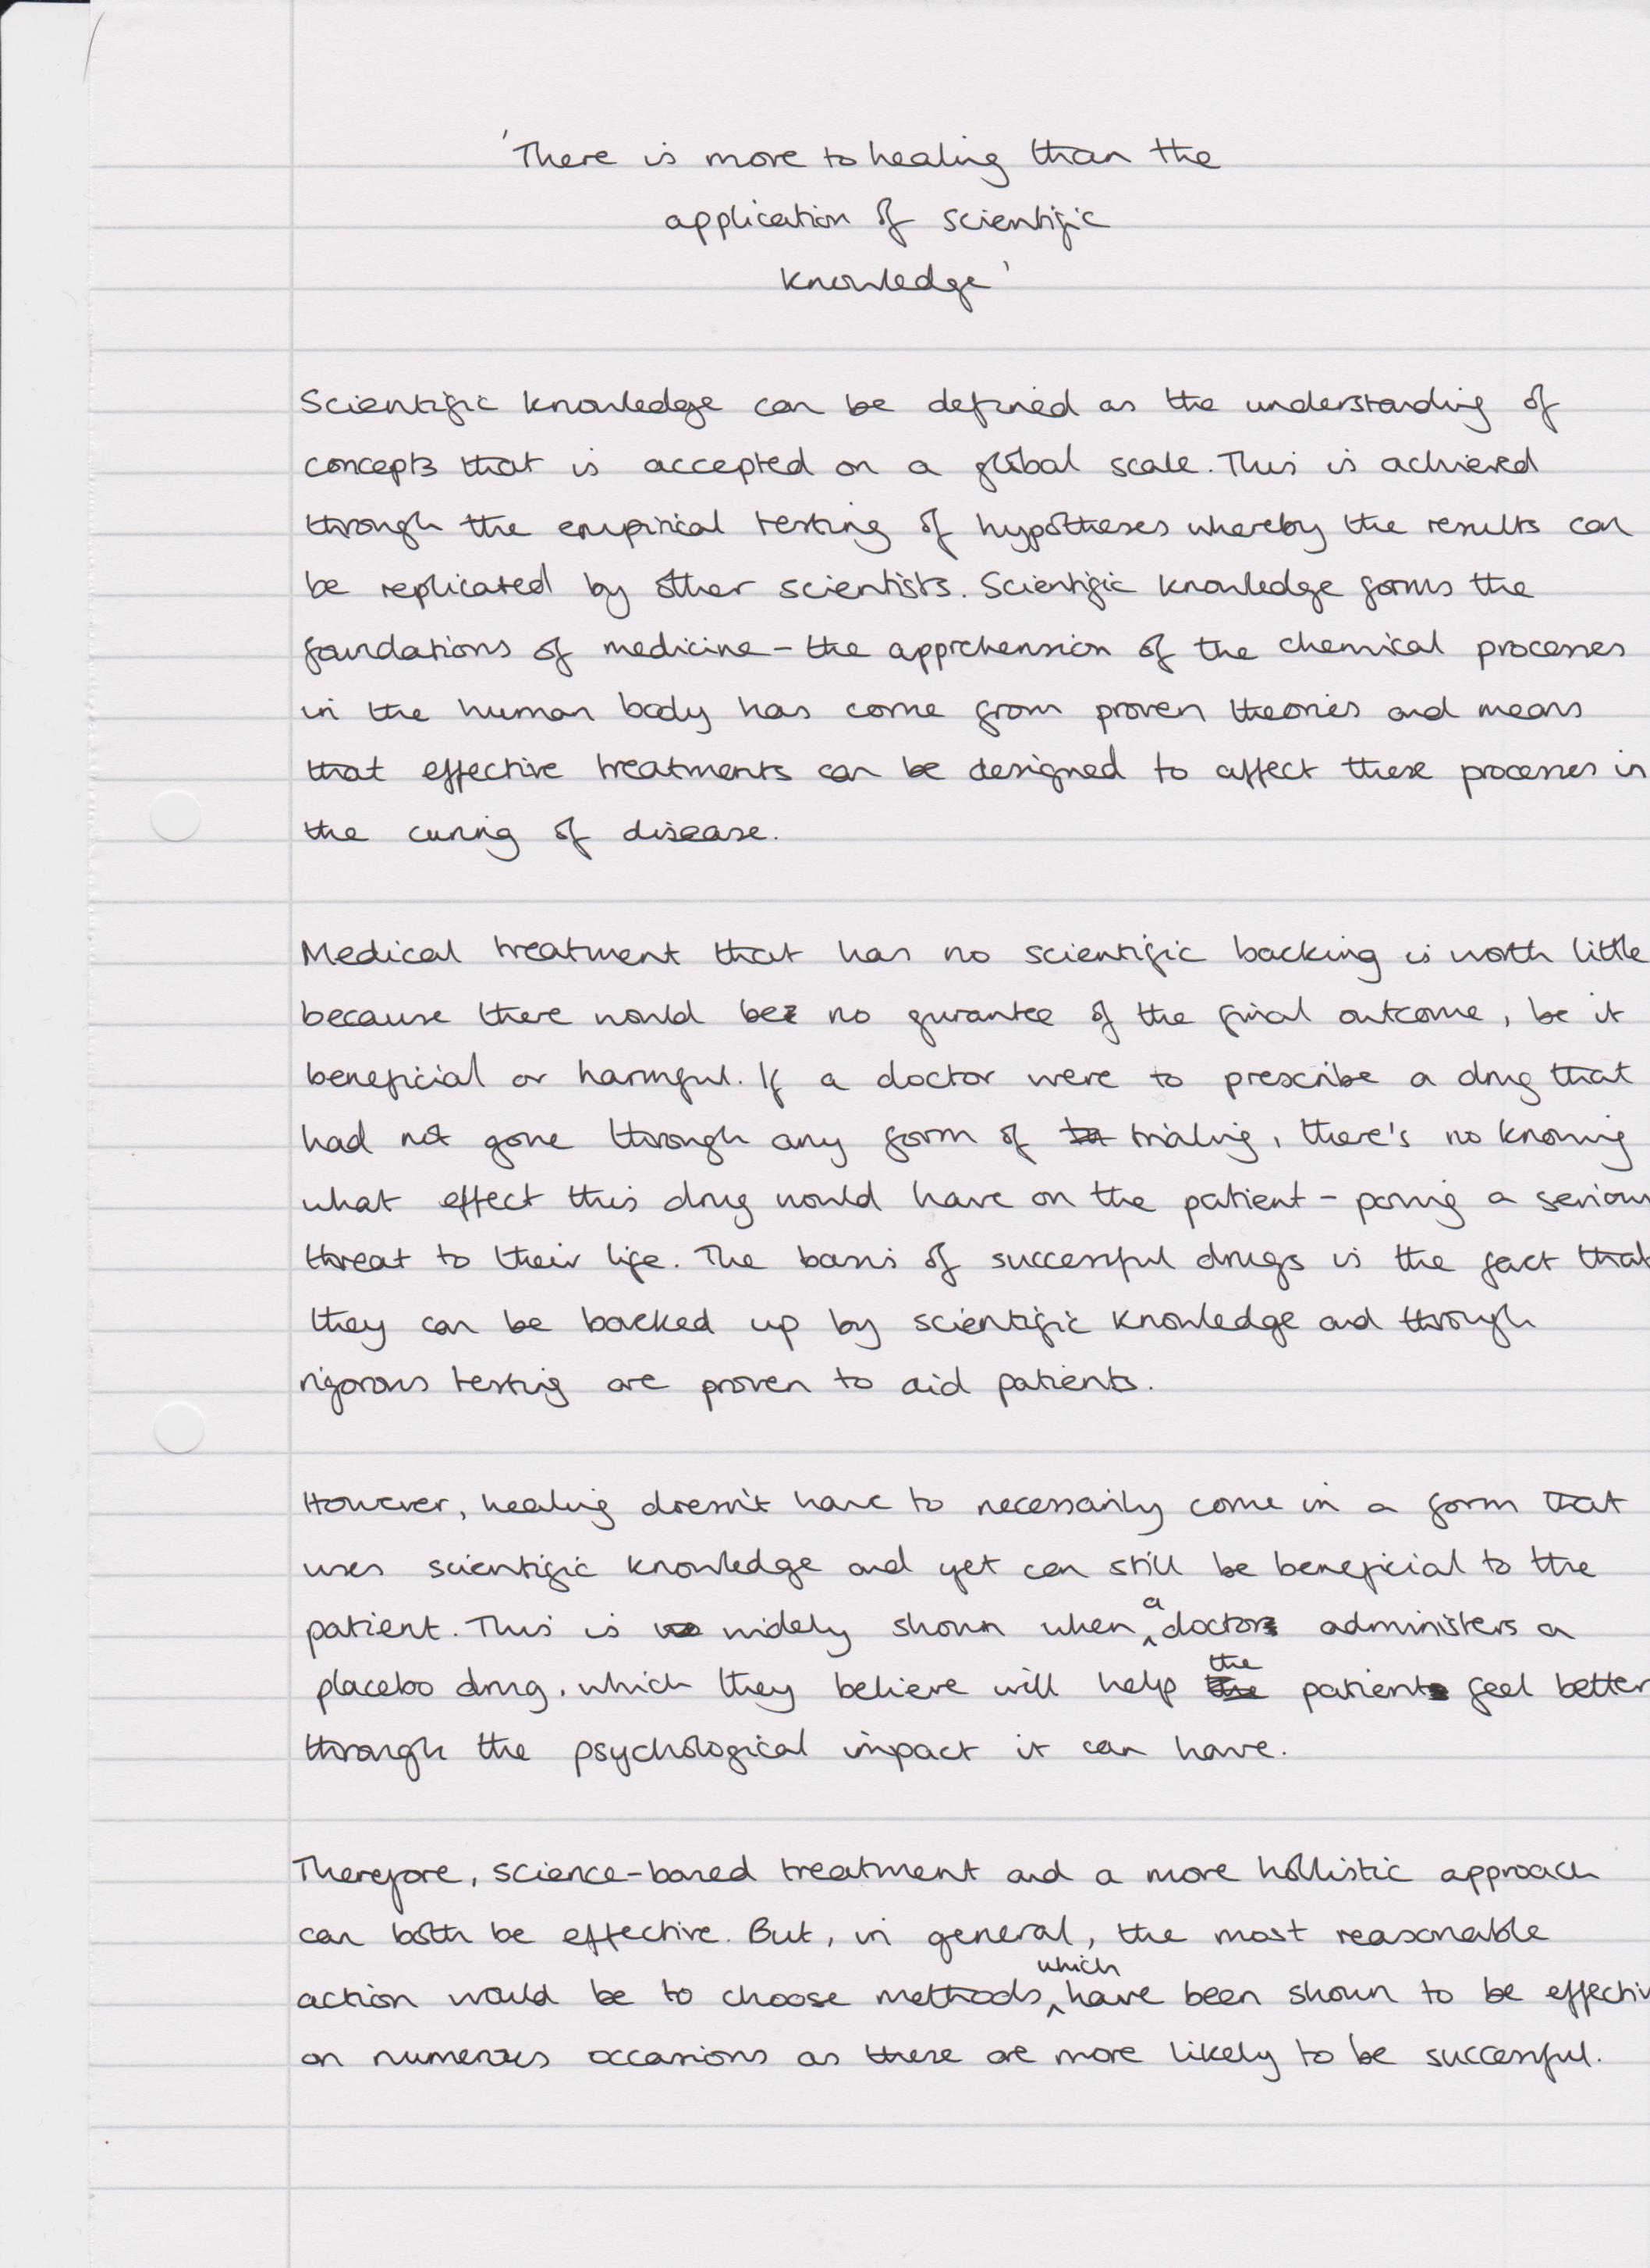 Please read essay